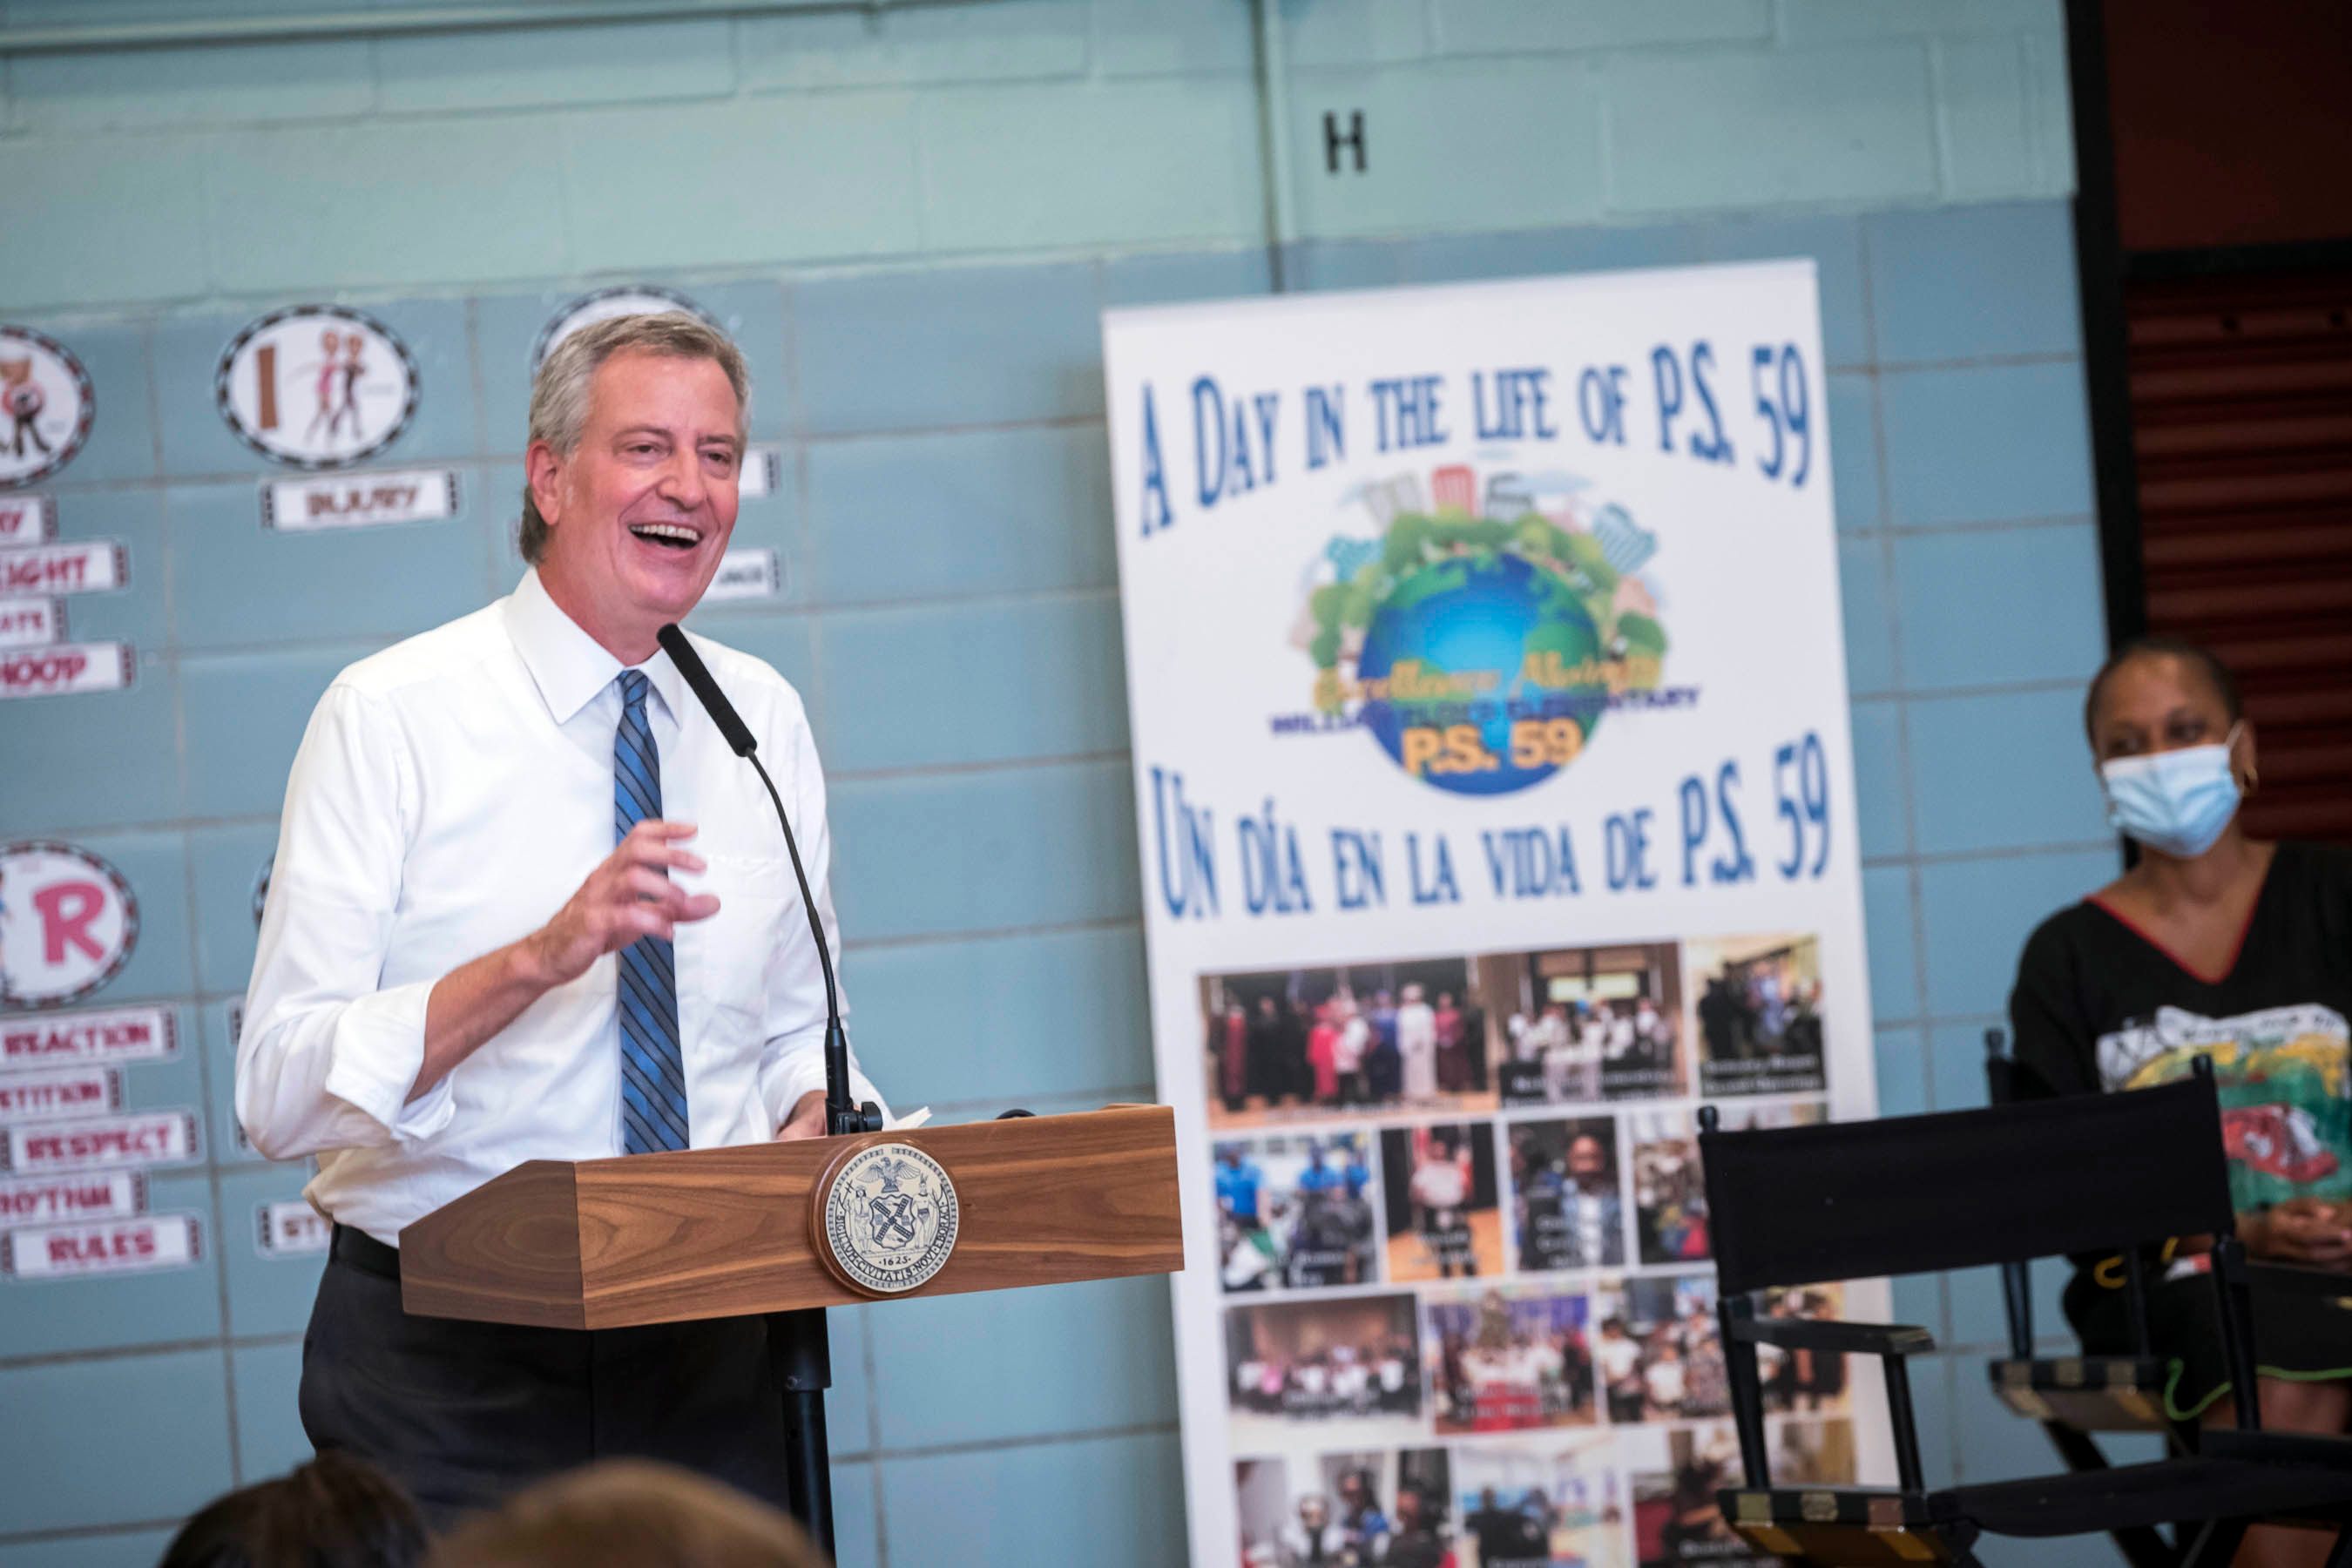 Mayor Bill de Blasio toured PS 59 in Brooklyn, Sept. 2, 2020.